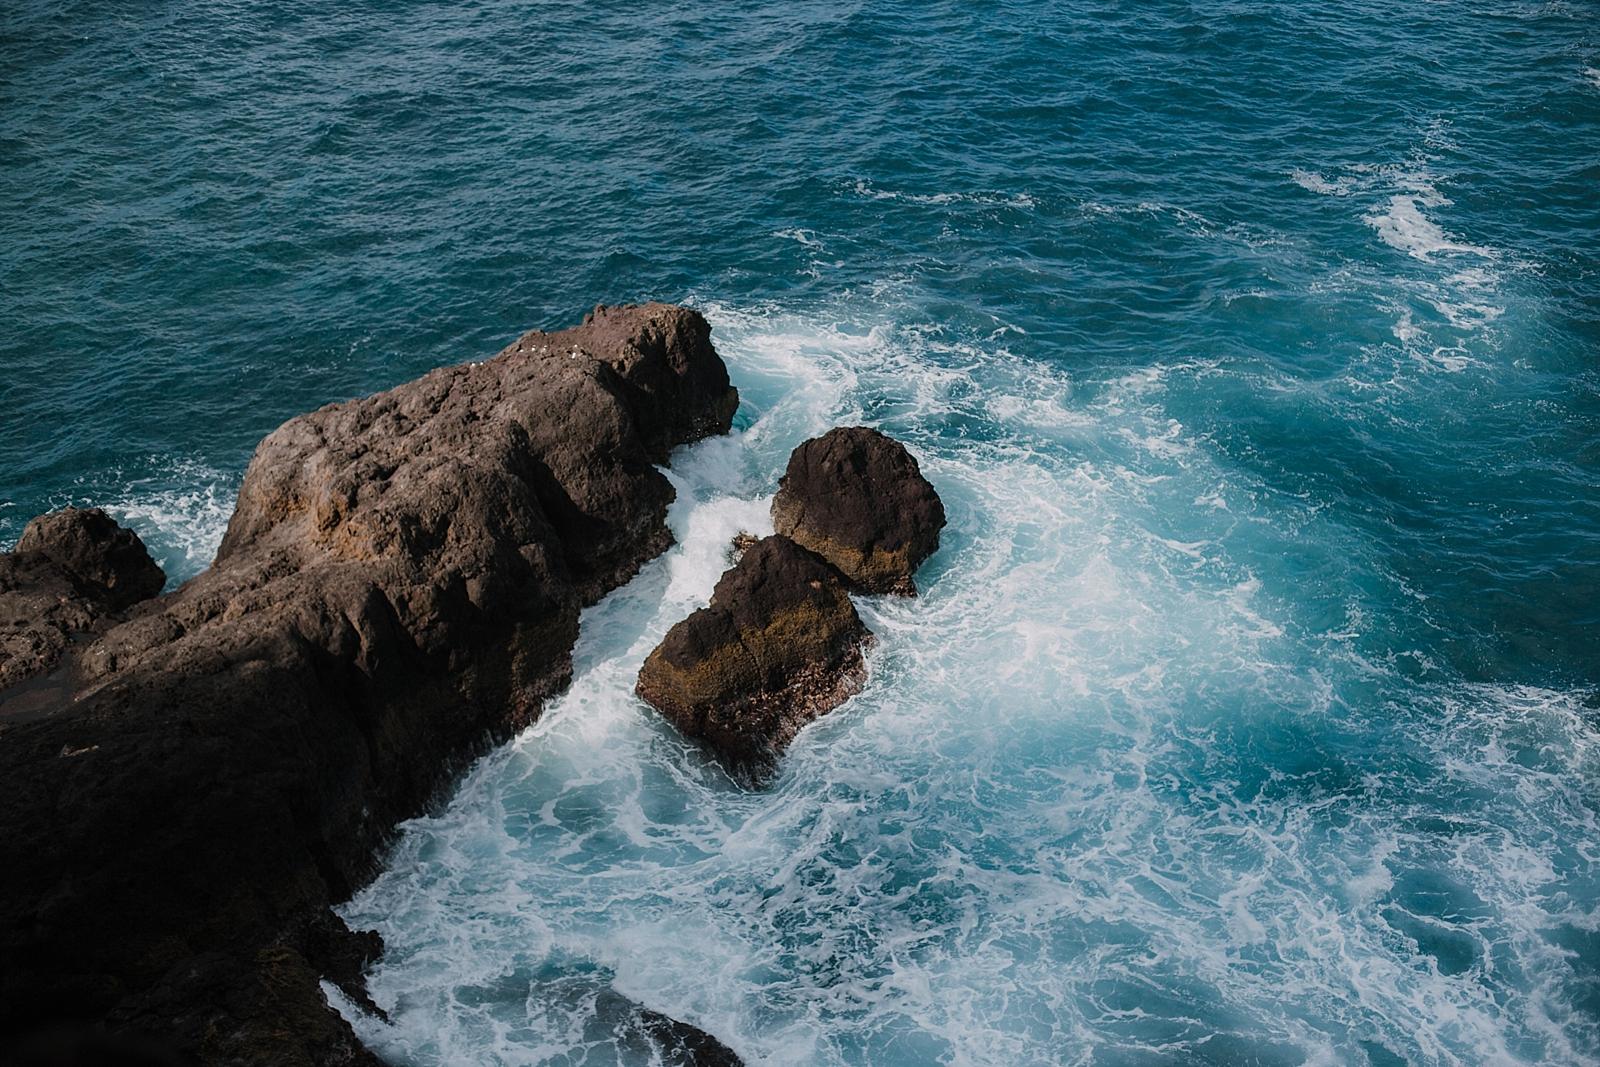 water on cliffside, lahaina wedding photographer, maui wedding photographer, hawaii wedding photographer, maui adventure photographer